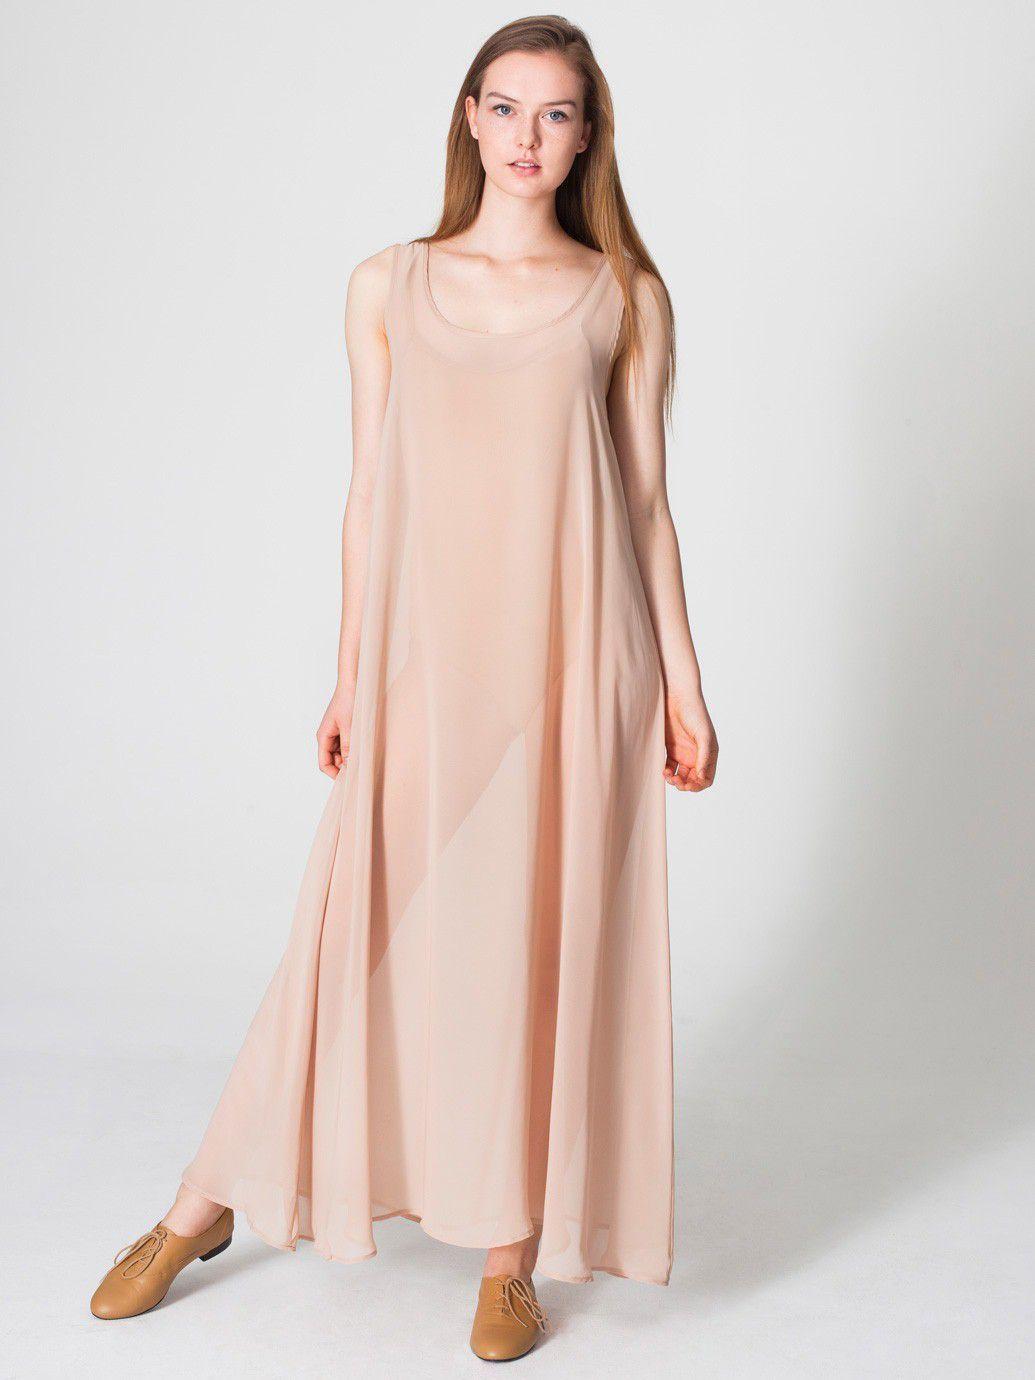 American Apparel Tan Chiffon Sheer Scoop Neck Women Loose Fit Long Maxi Dress Os Long Maxi Dress A Line Maxi Dress Dresses [ 1380 x 1035 Pixel ]